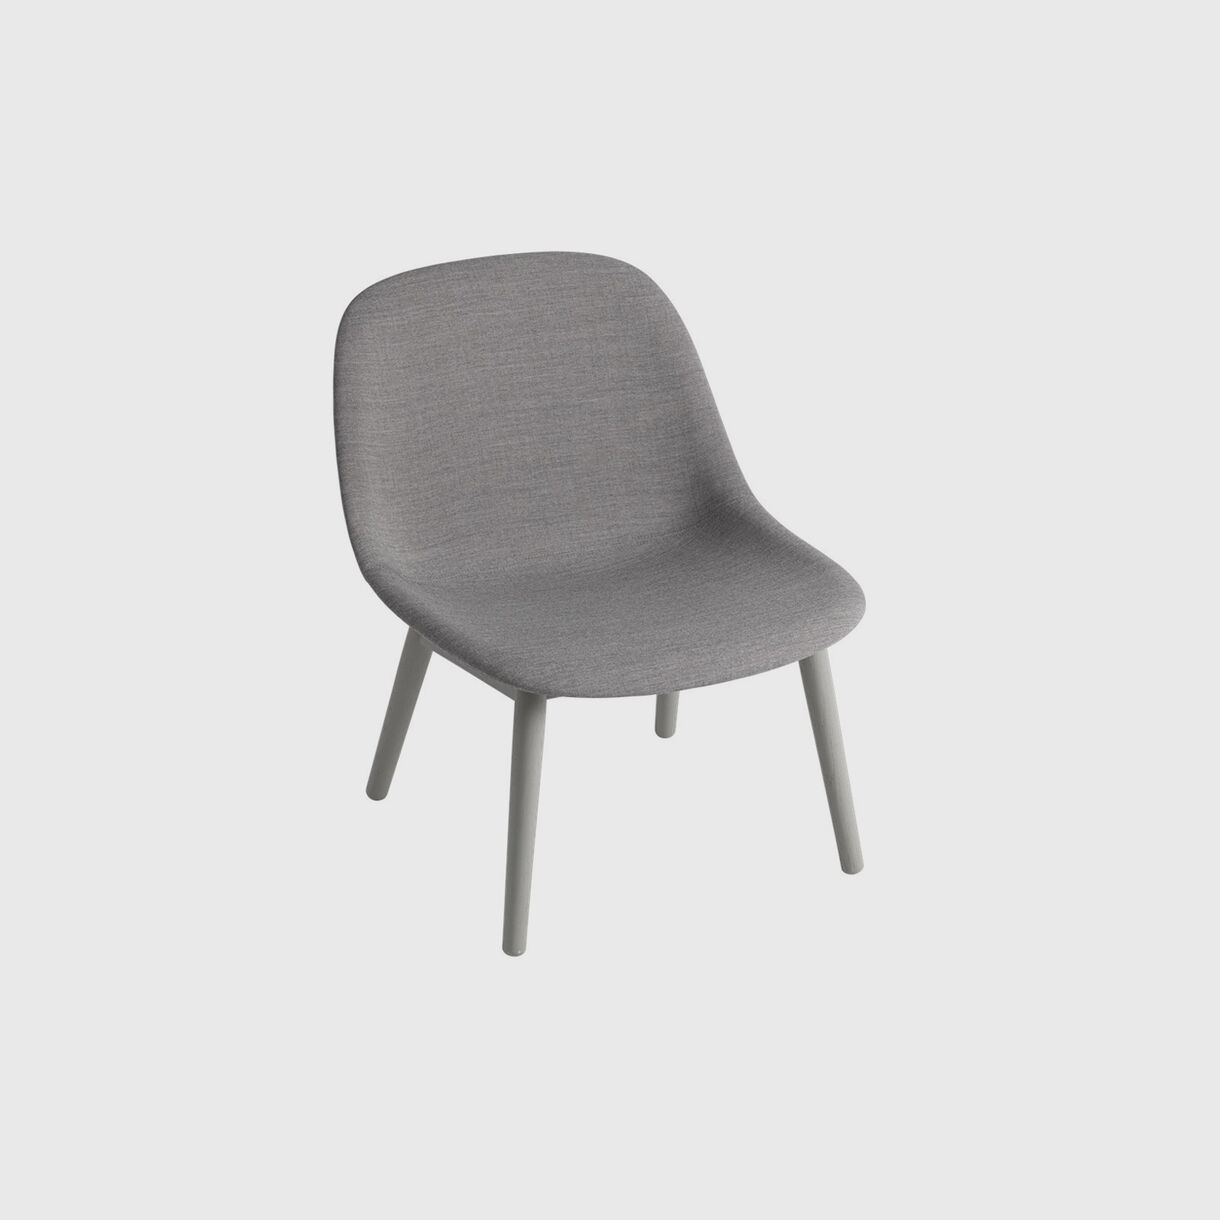 Fiber Lounge Chair Wood Base, Upholstered, Remix 133